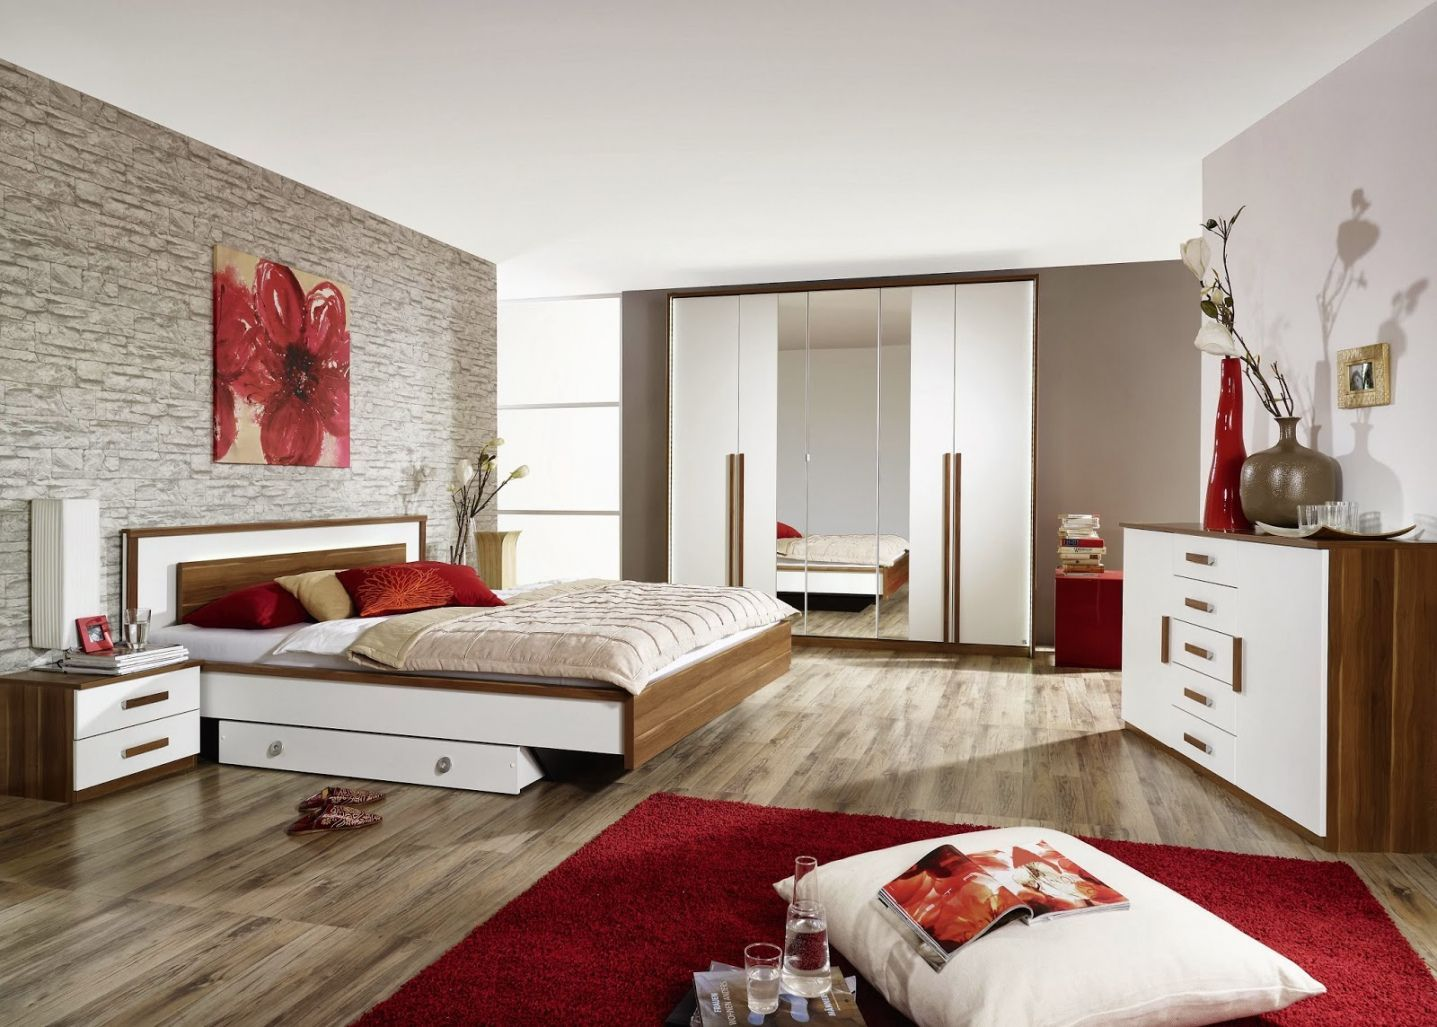 Modern bedroom designs for couples bedroom window treatment ideas